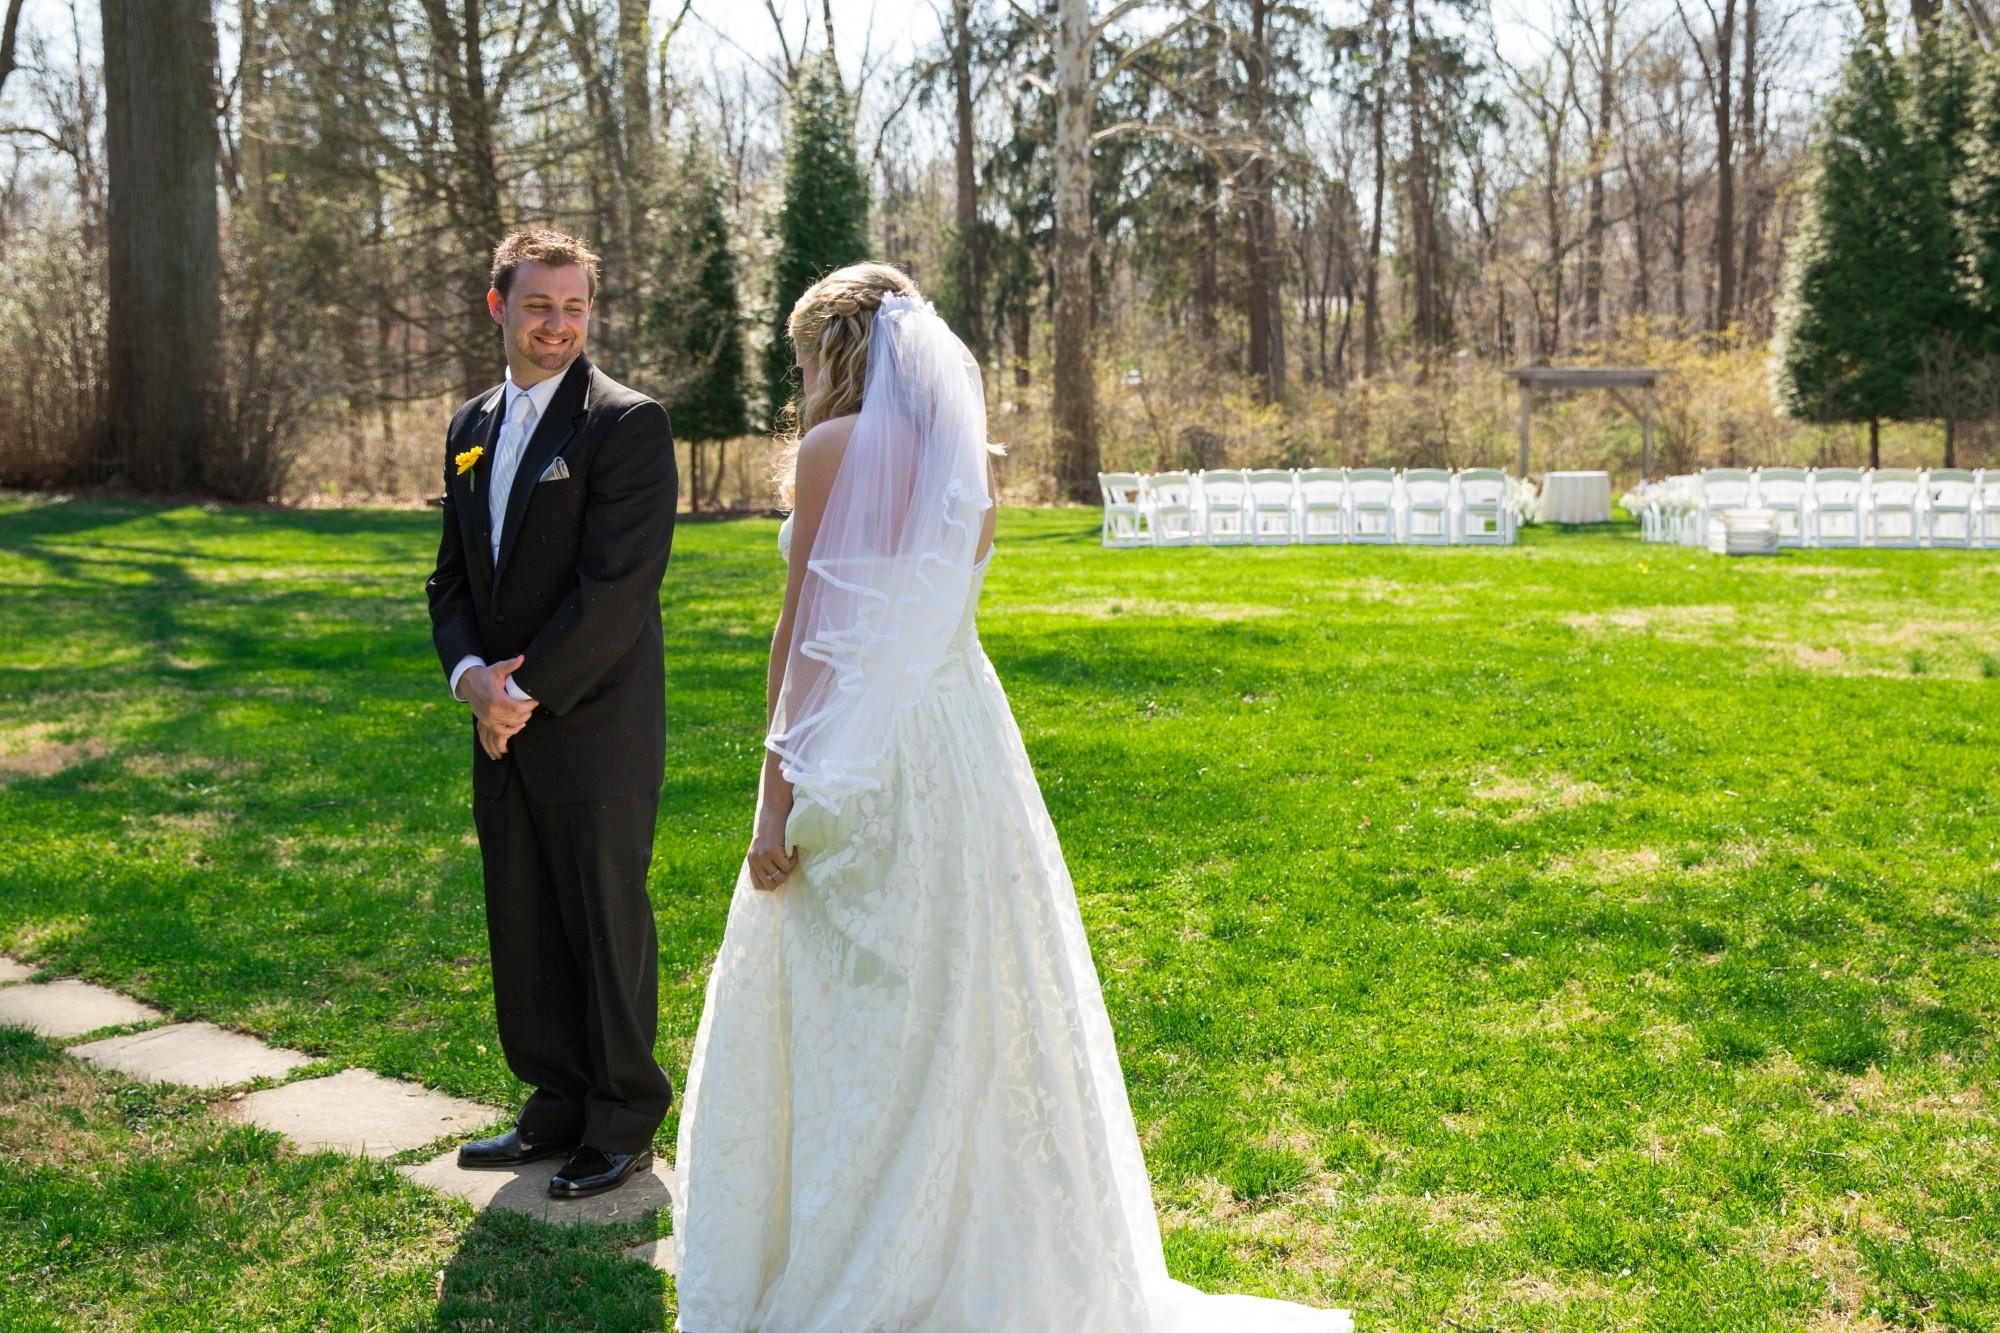 Amber Foster Smith Photography - Destination Wedding Photographer